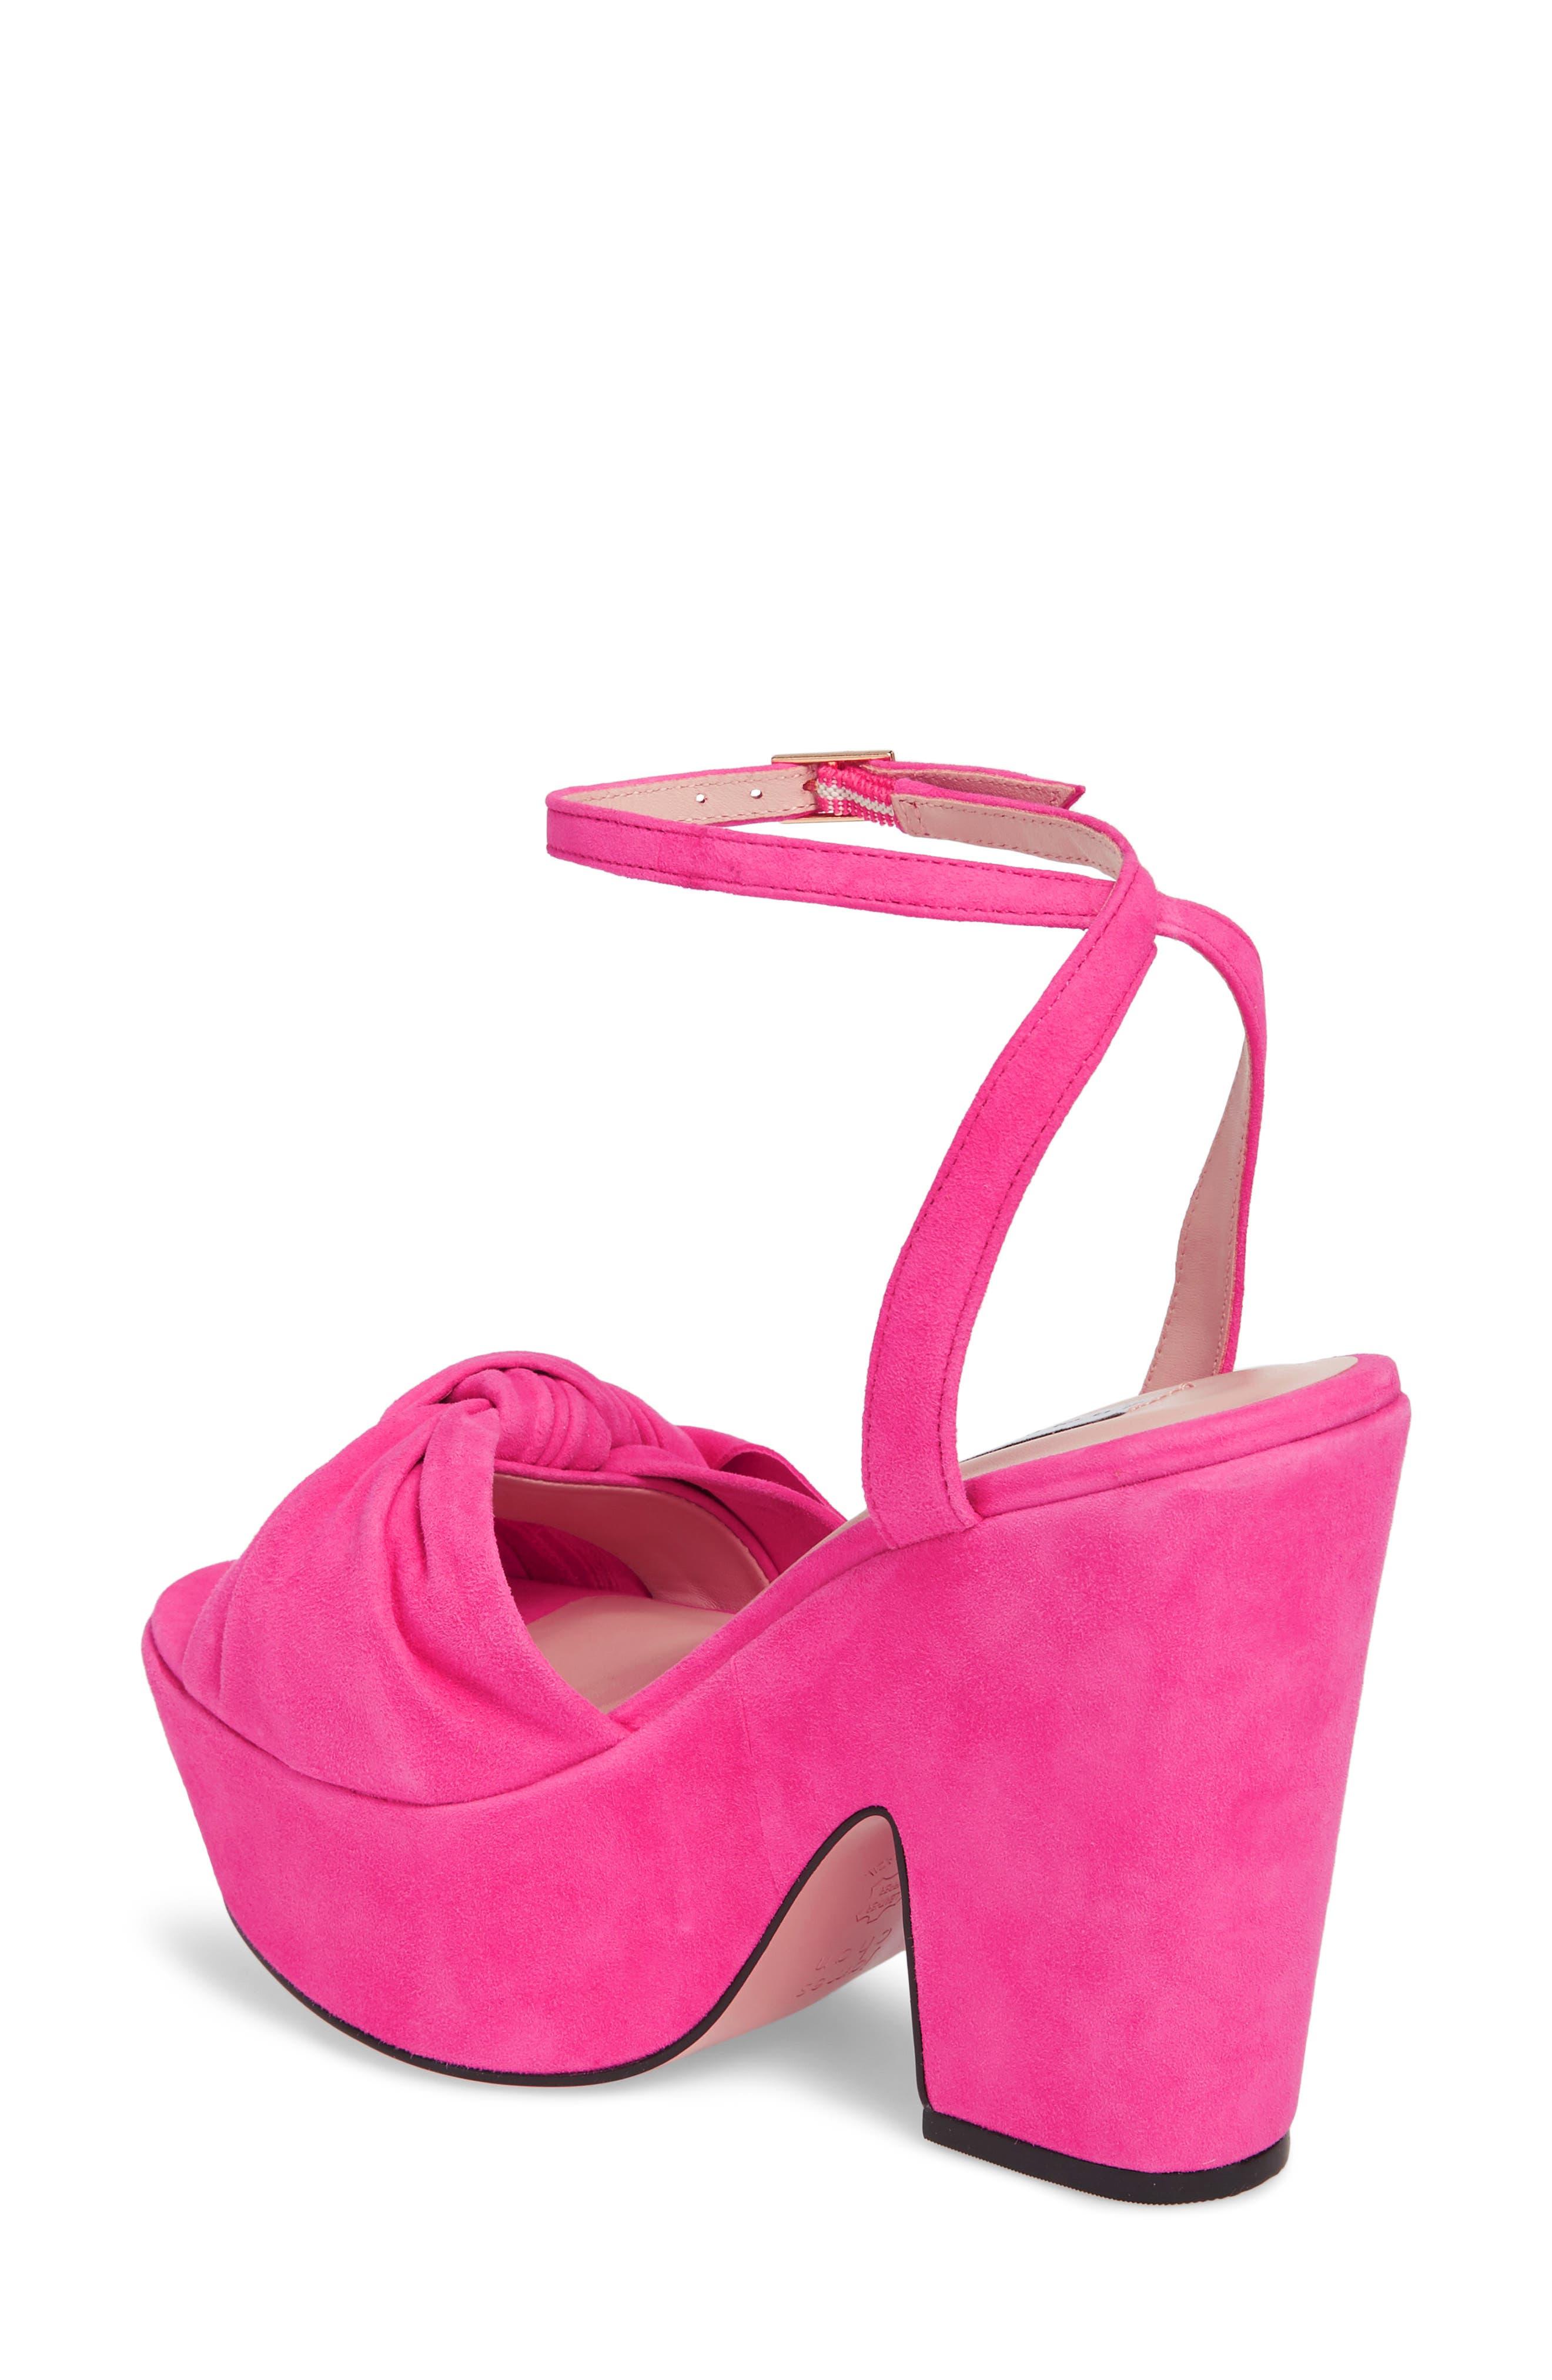 Pinky Platform Sandal,                             Alternate thumbnail 7, color,